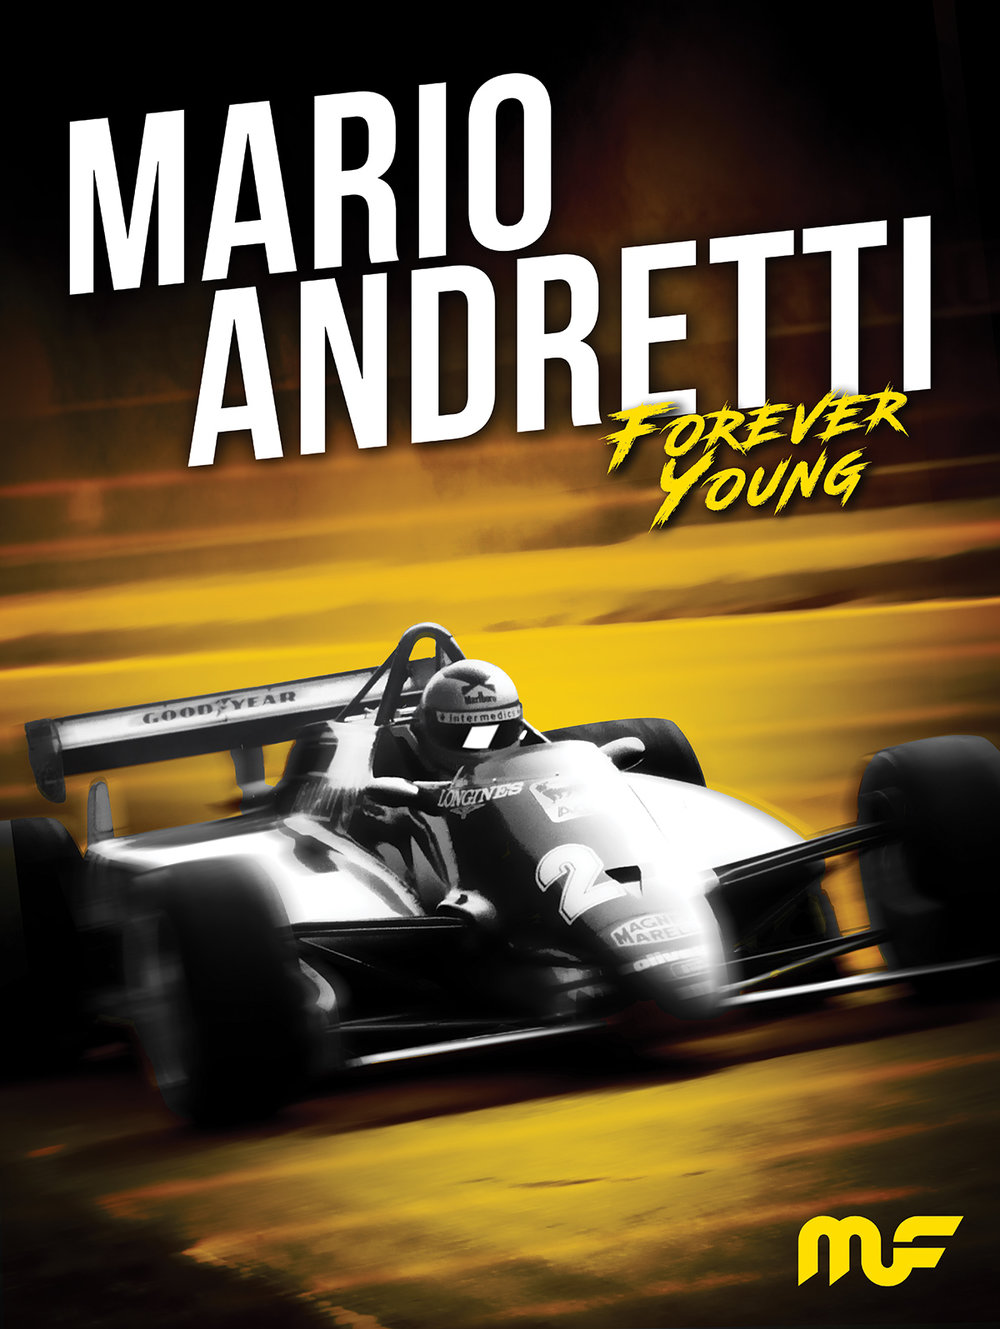 Mario_Andretti.jpg